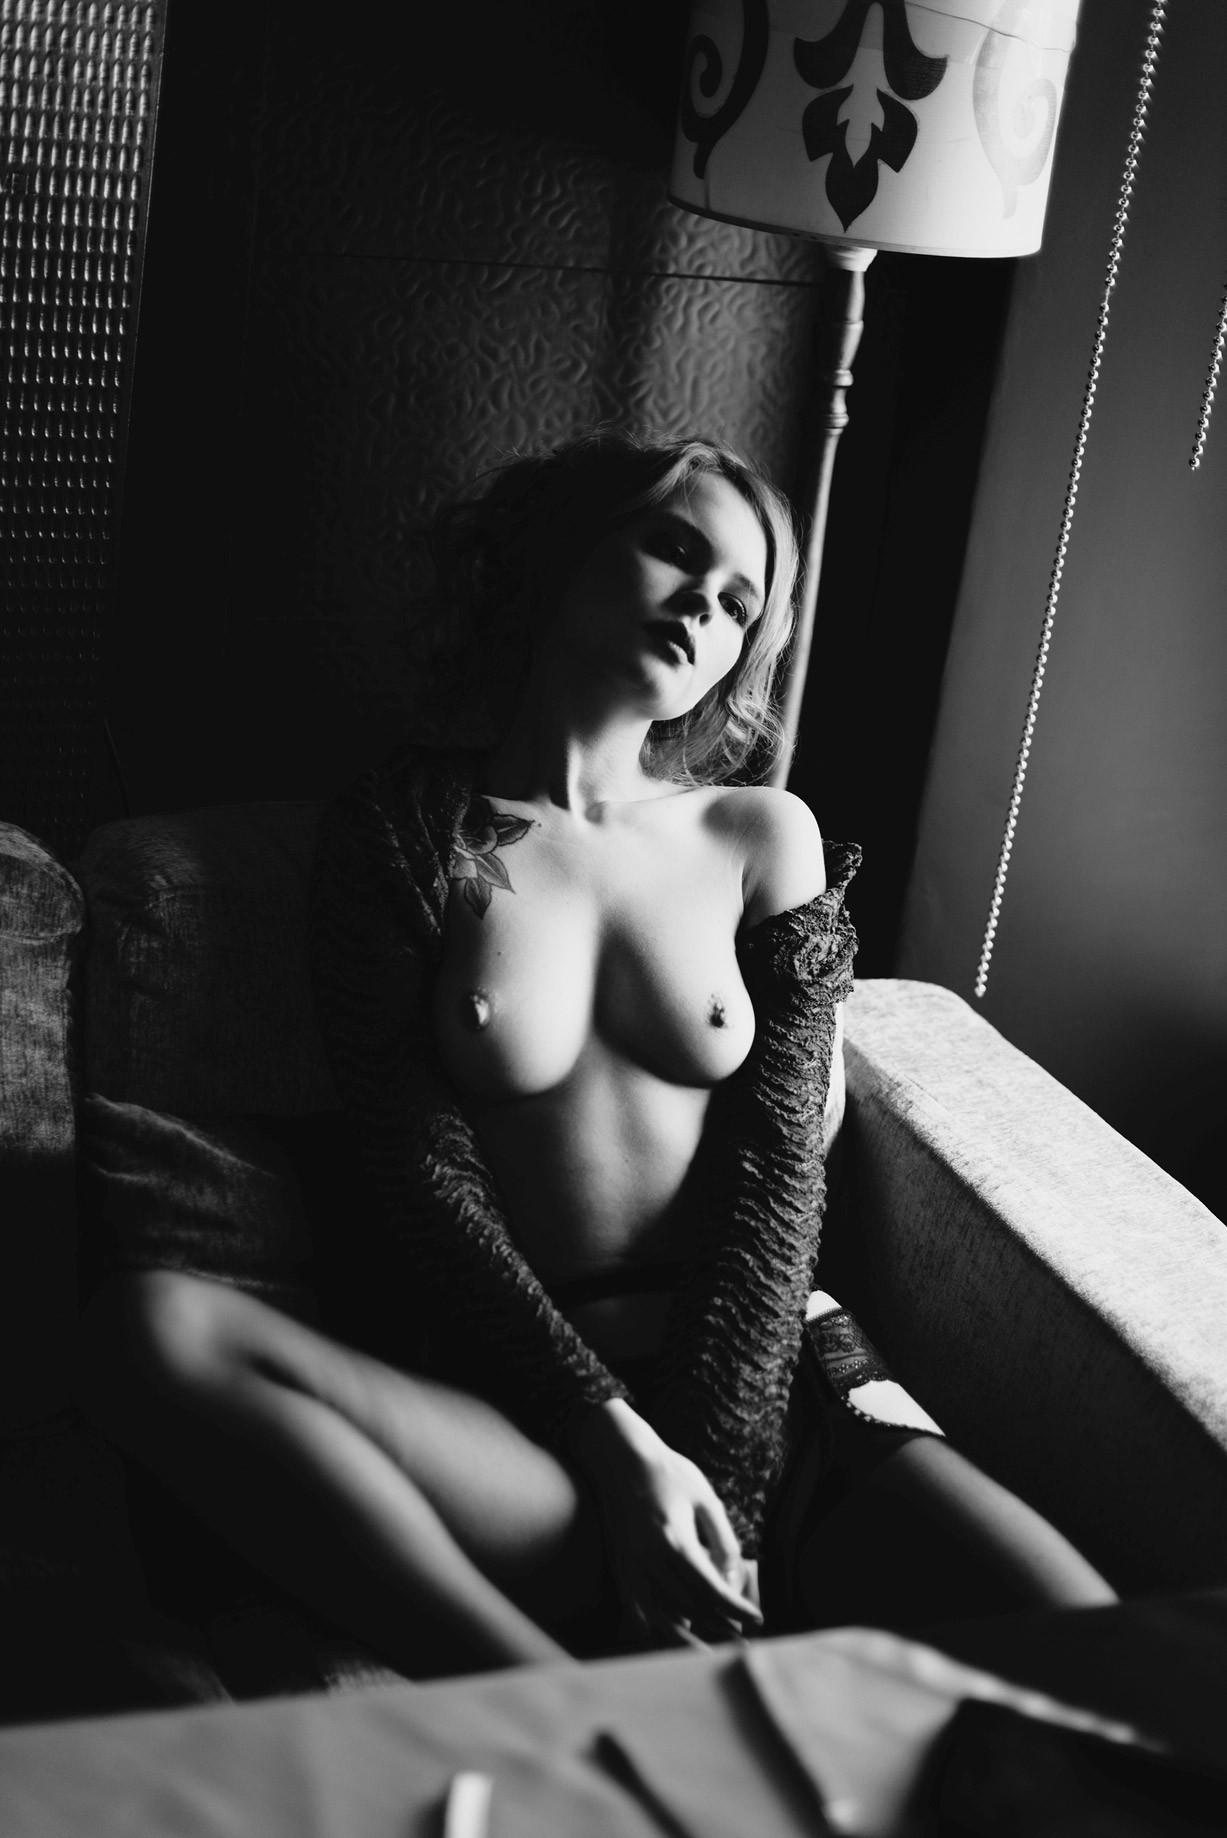 Анастасия Щеглова / Anastasiya Scheglova nude by Georgy Goryunov